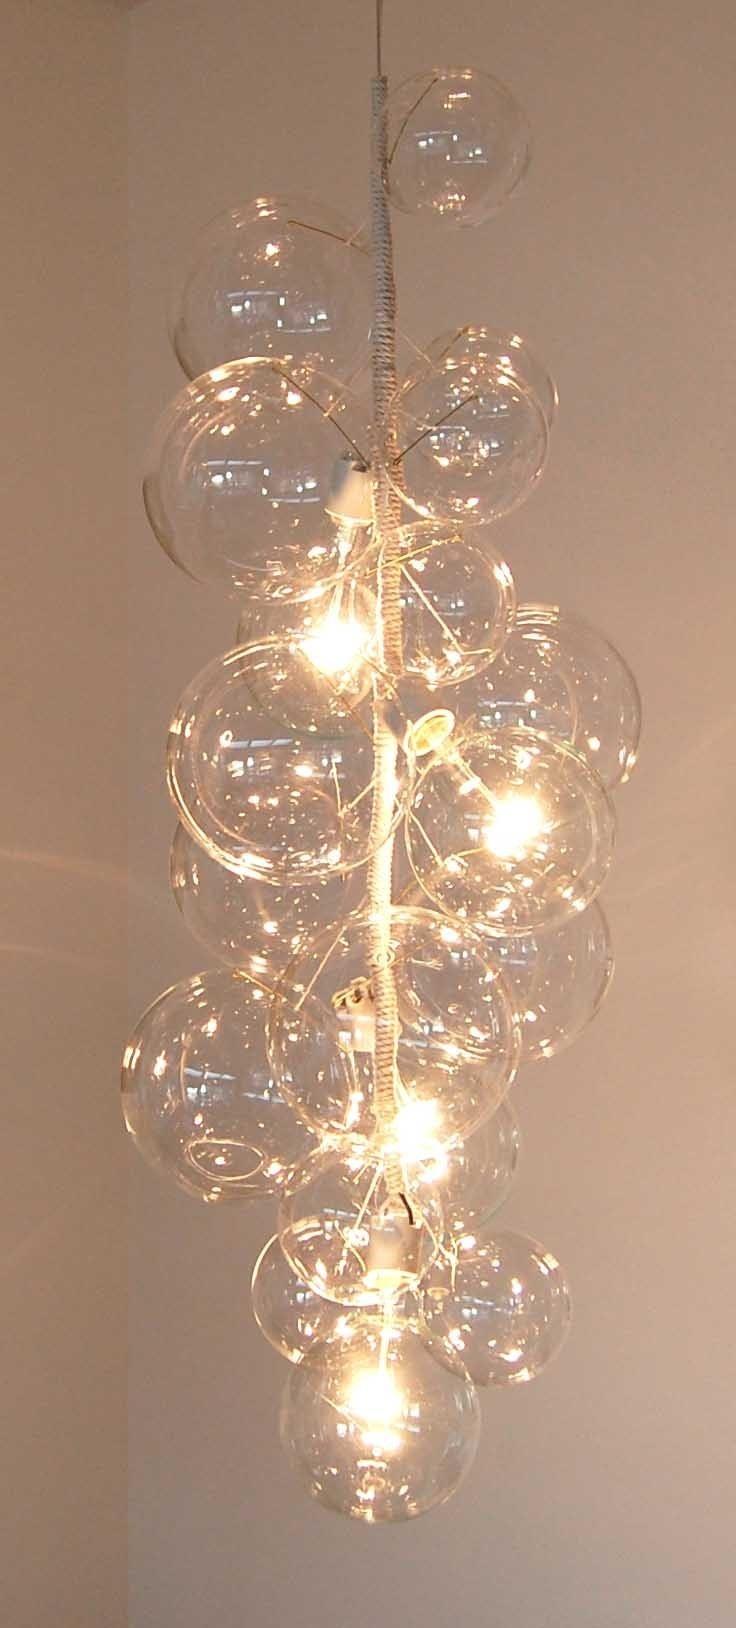 PELLE bubble chandelier from Etsy design